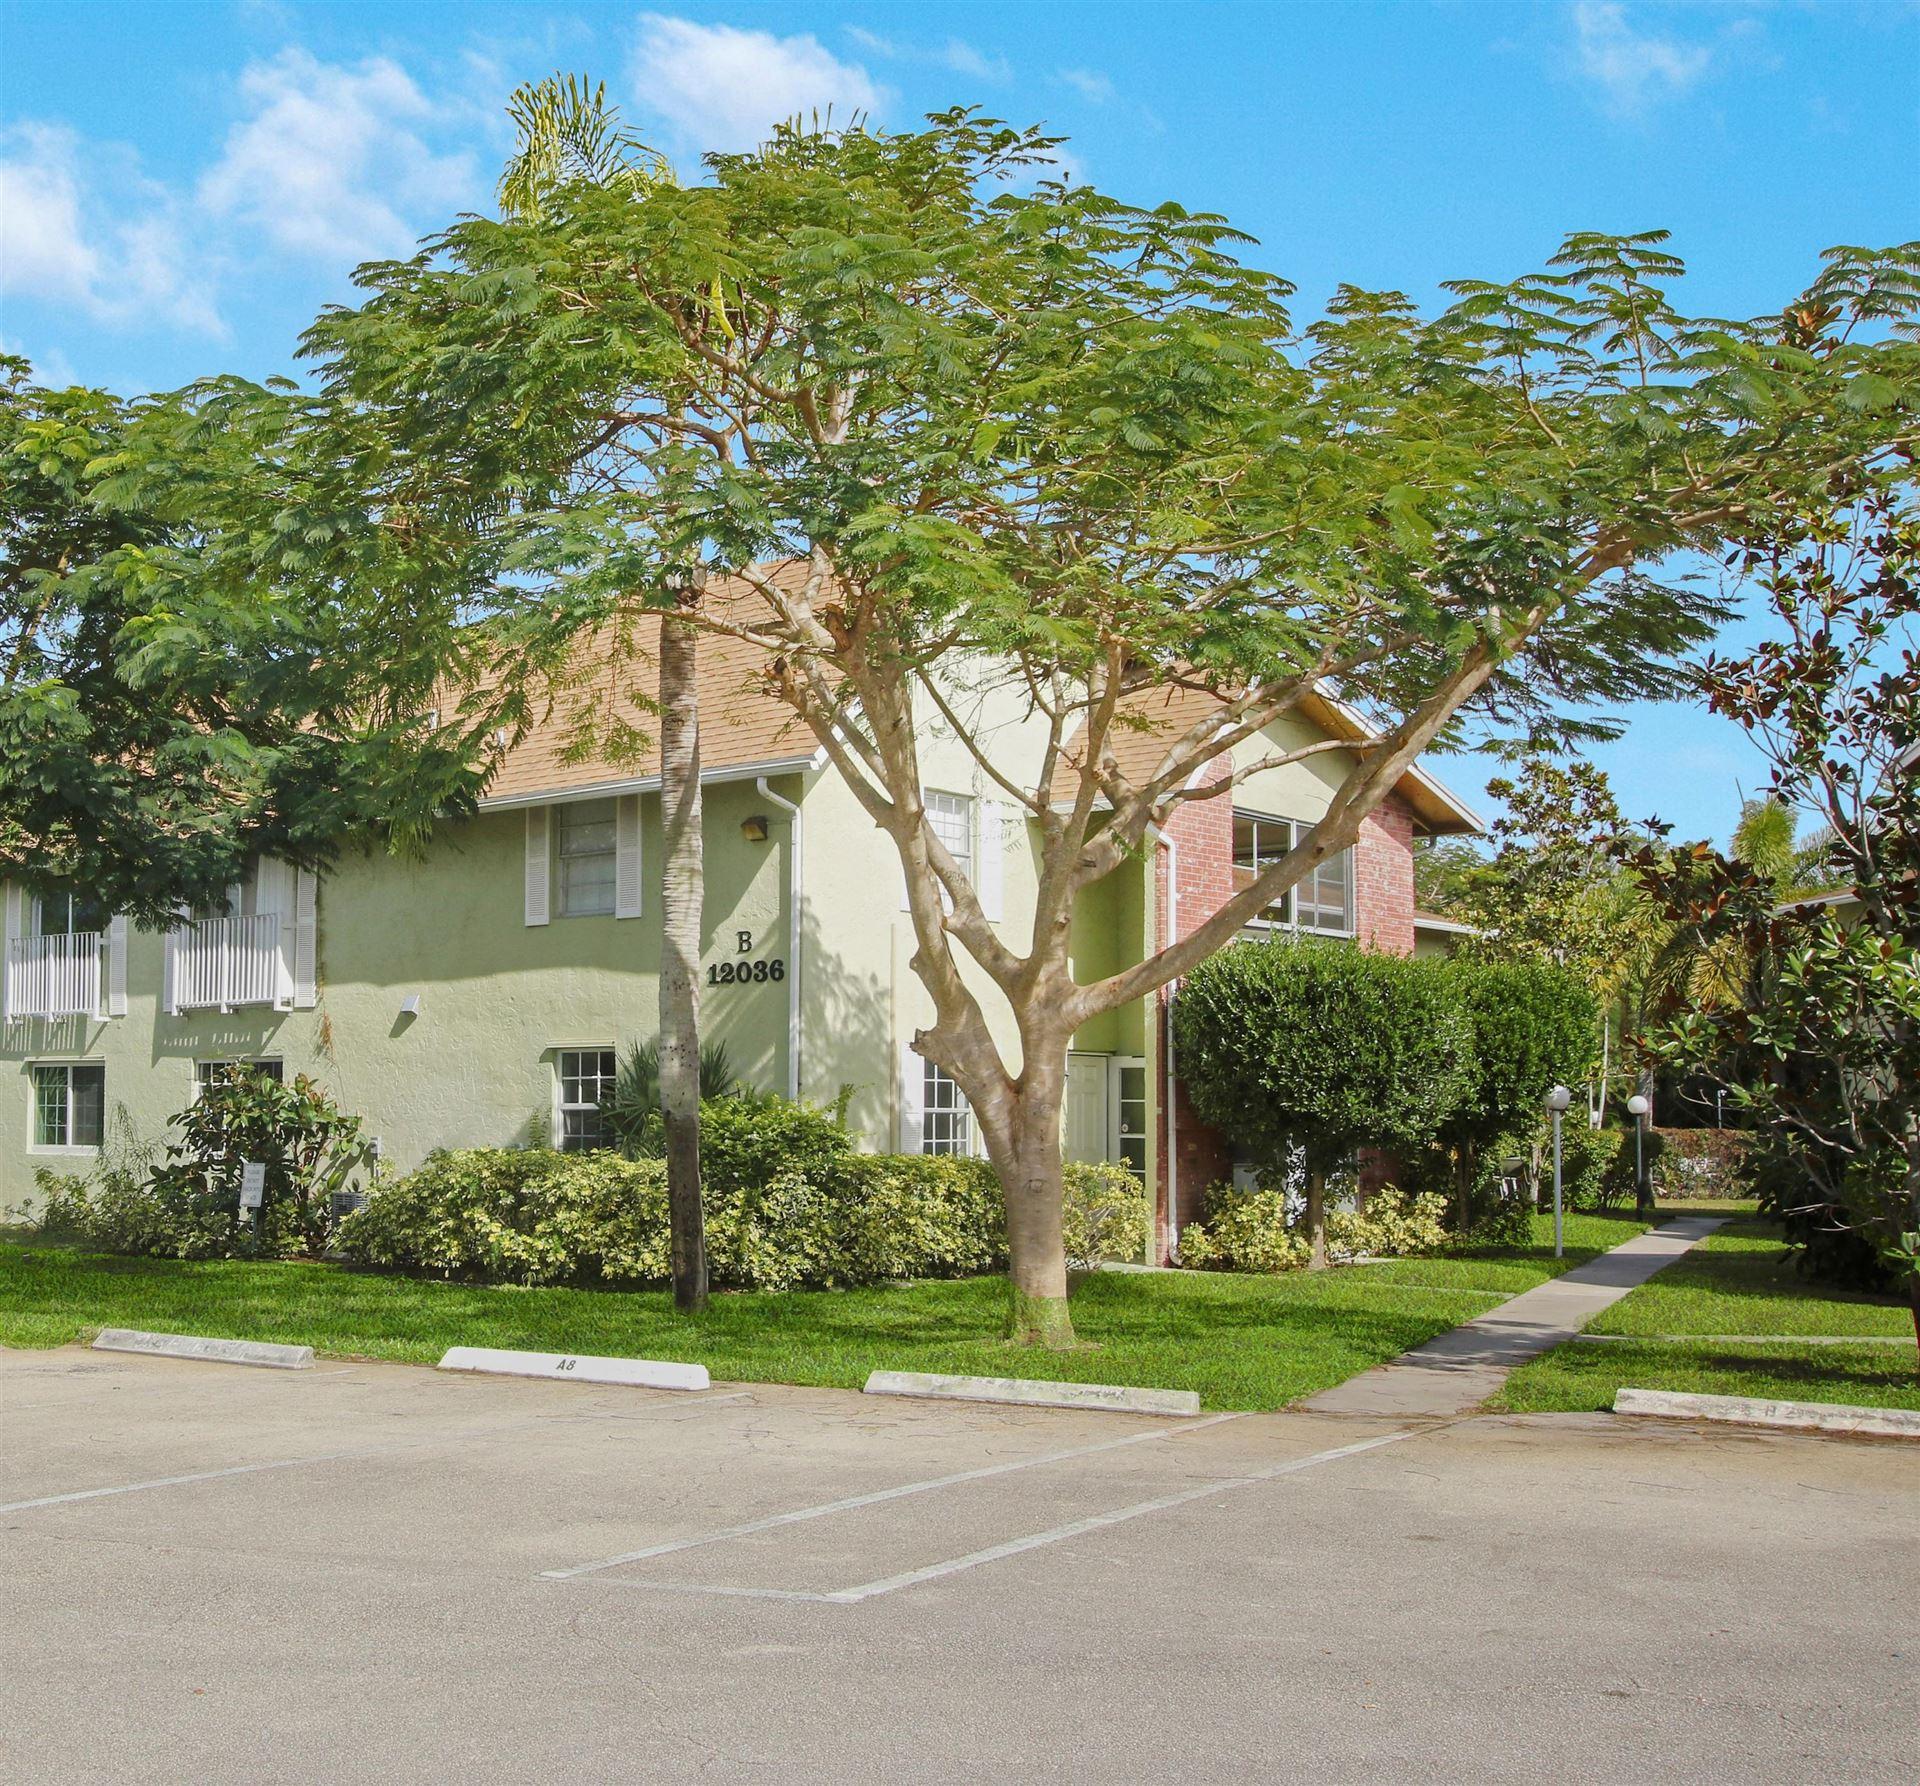 Photo of 12036 Alternate A1a #B5, Palm Beach Gardens, FL 33410 (MLS # RX-10686077)